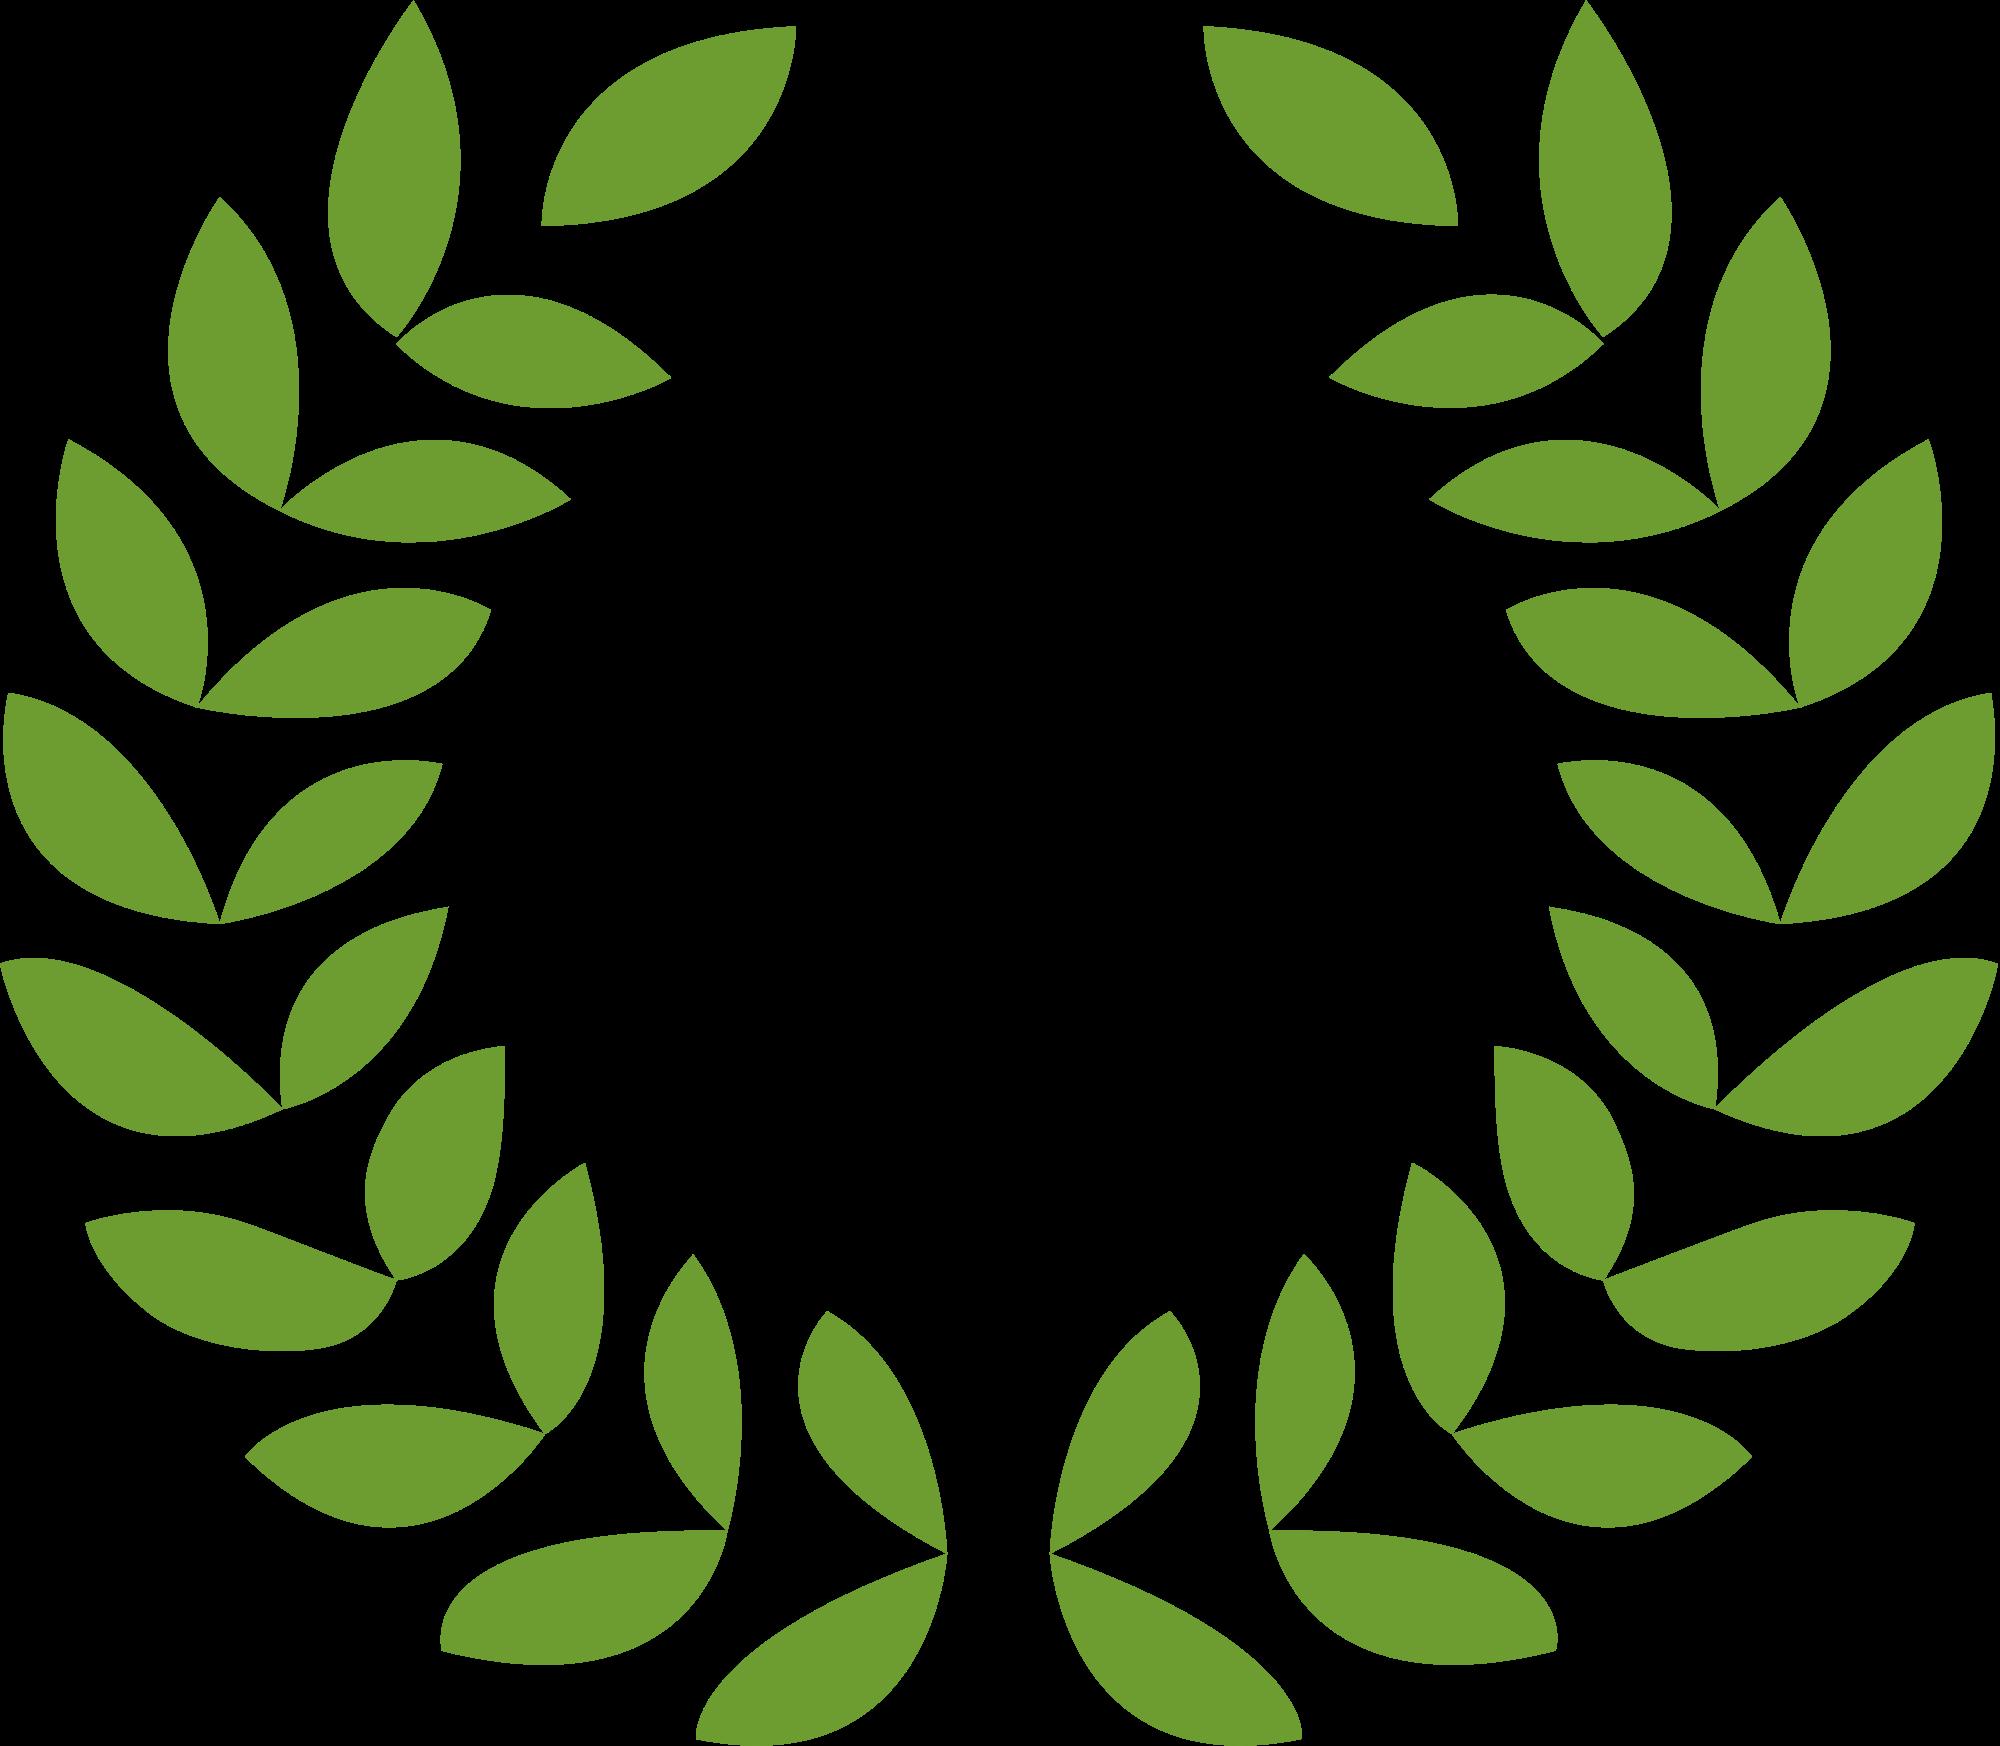 2000x1746 Filegreek Roman Laurel Wreath Vector.svg